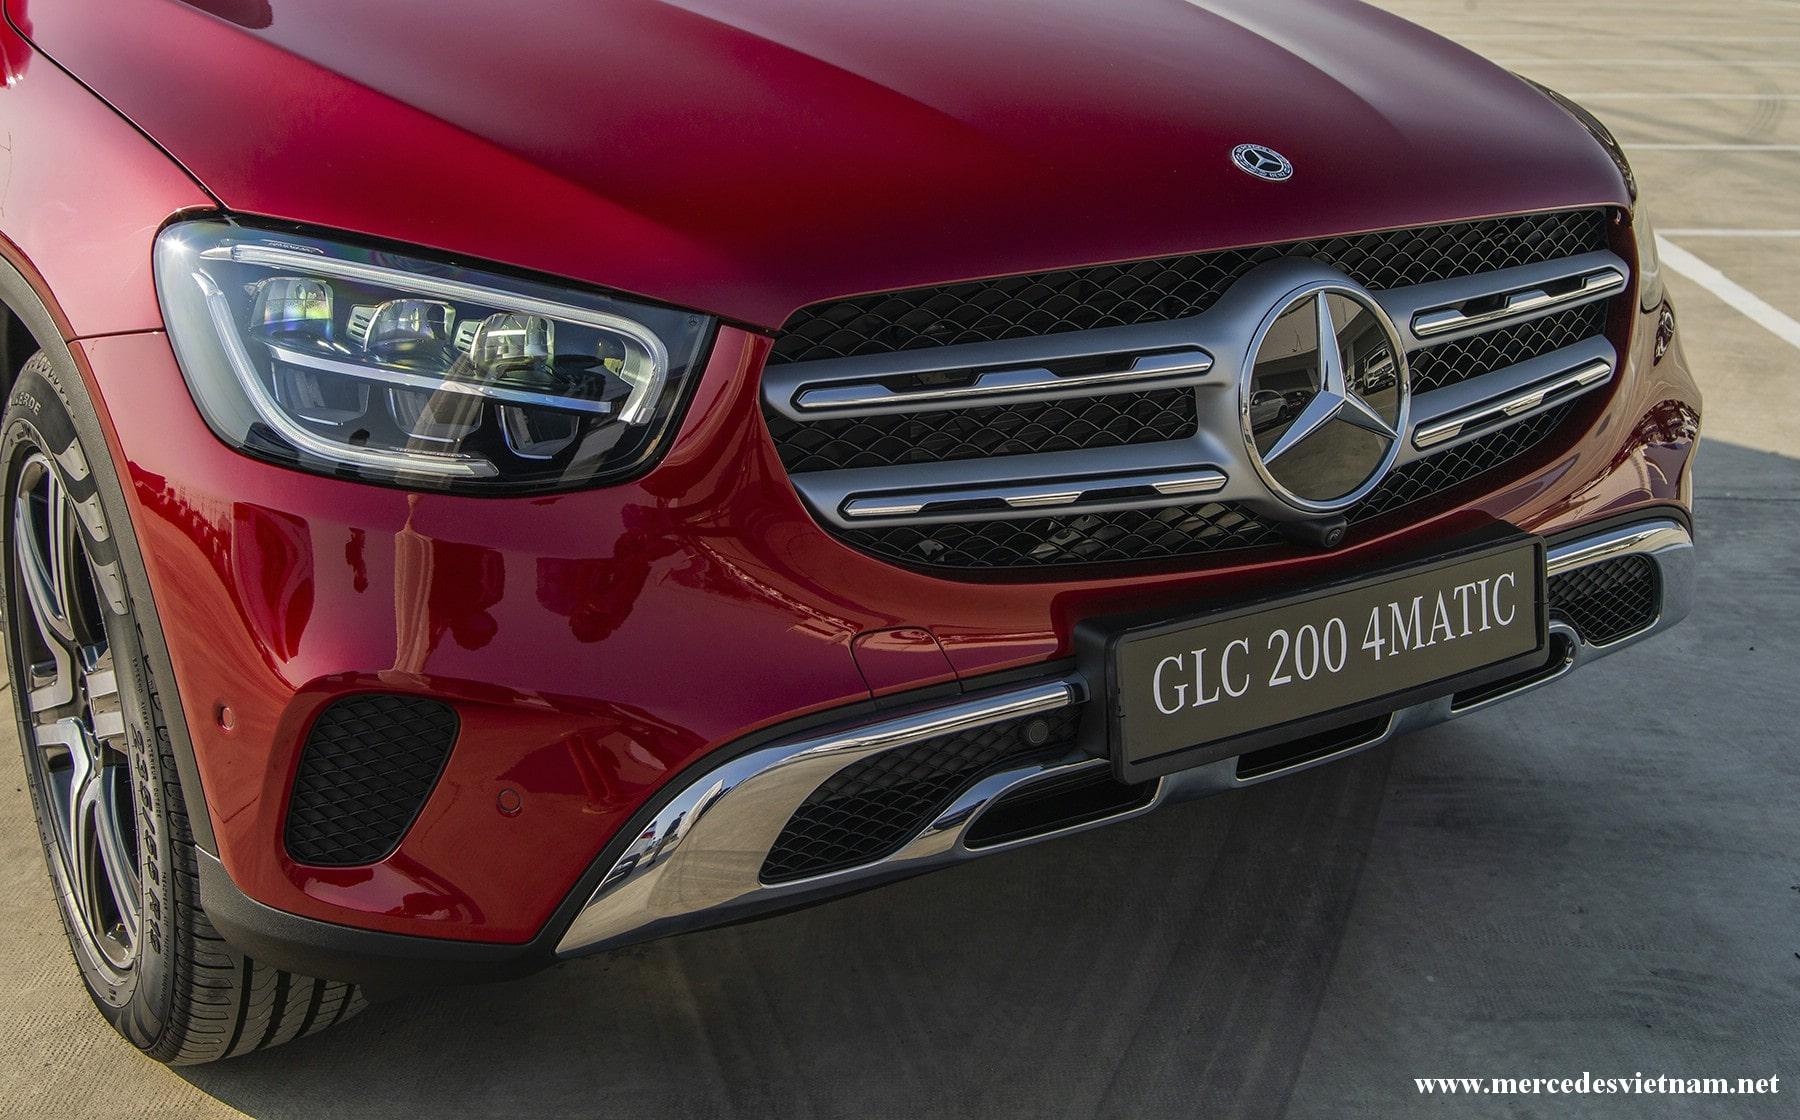 Mercedes GLC 200 4Matic 2021